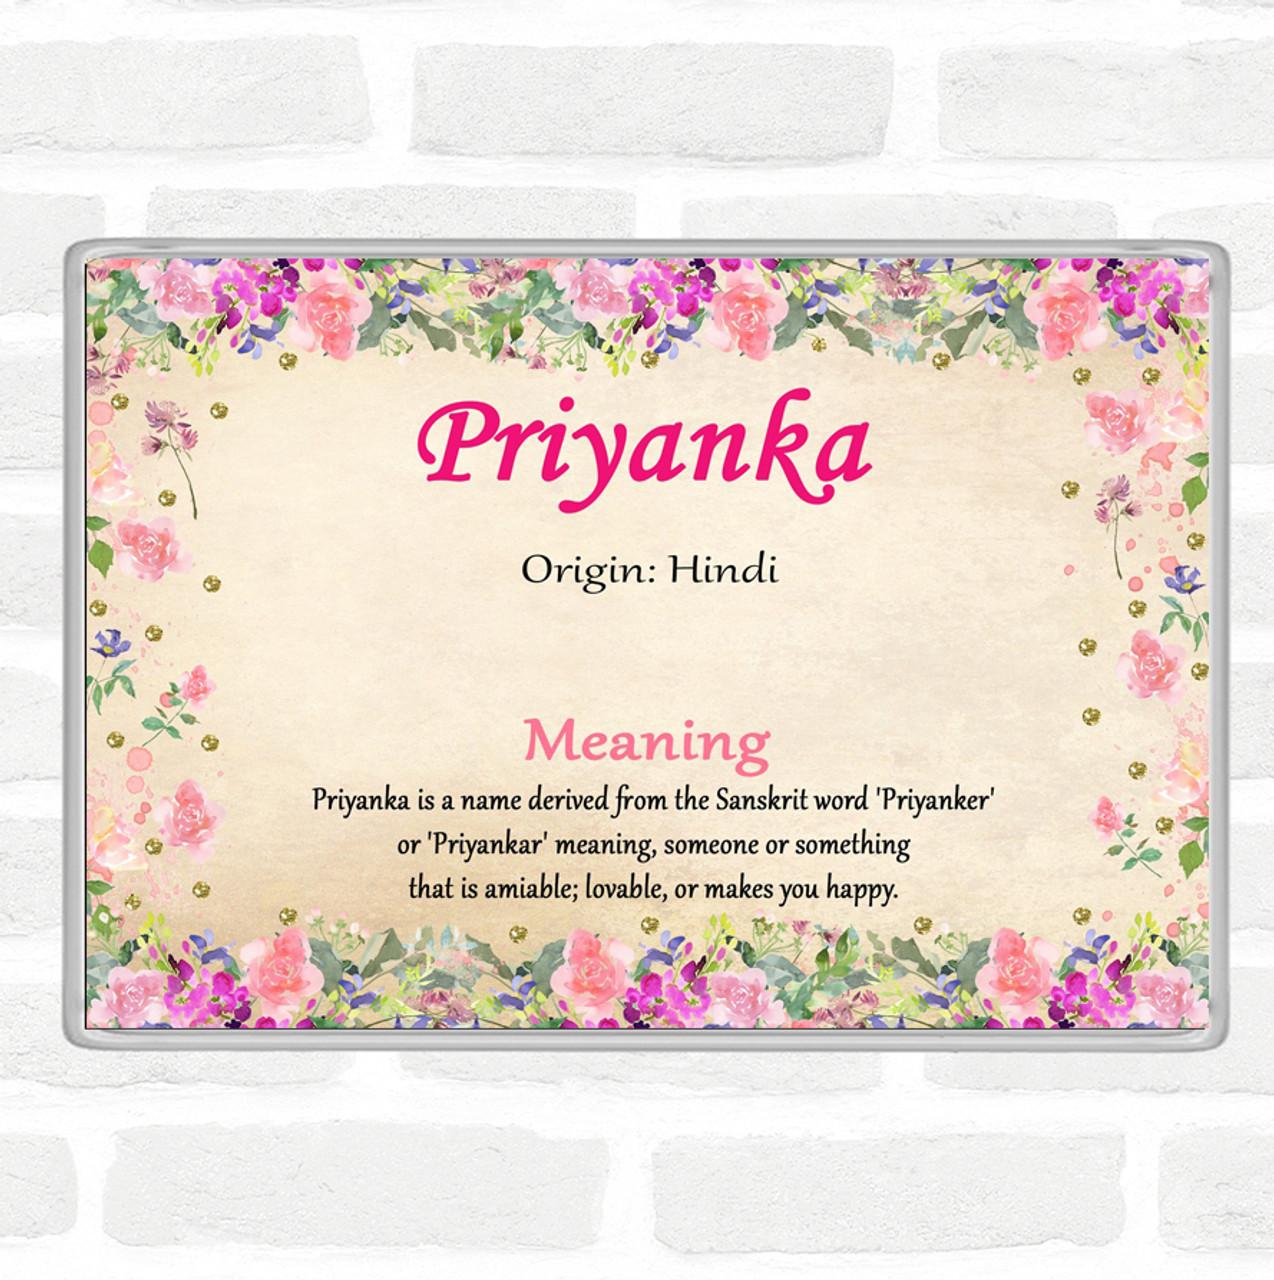 Priyanka Name Meaning Jumbo Fridge Magnet Floral The Card Zoo Baby names that sound like priyanka include parnaz, preama, premma, premmah, primma, princcess, princea, princee, princes, princesse, princey, princi, princie. priyanka name meaning jumbo fridge magnet floral